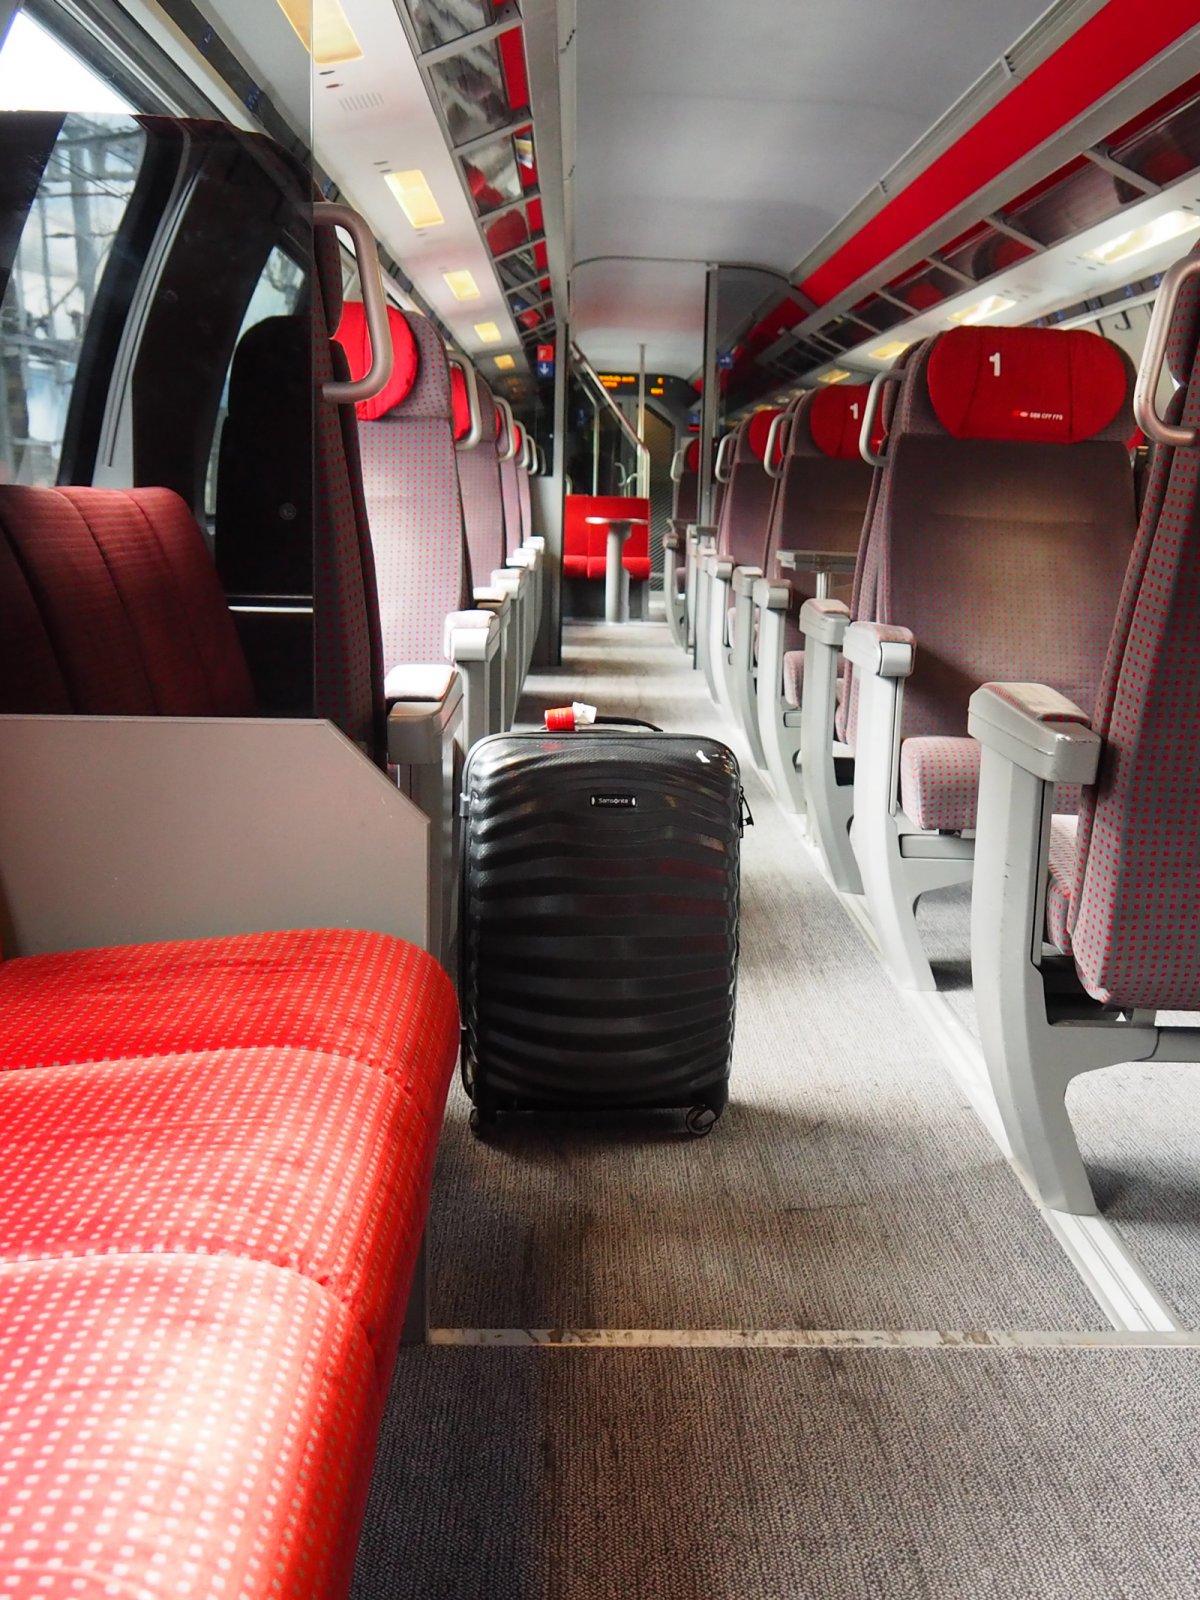 Swiss train first class cabin on SBB